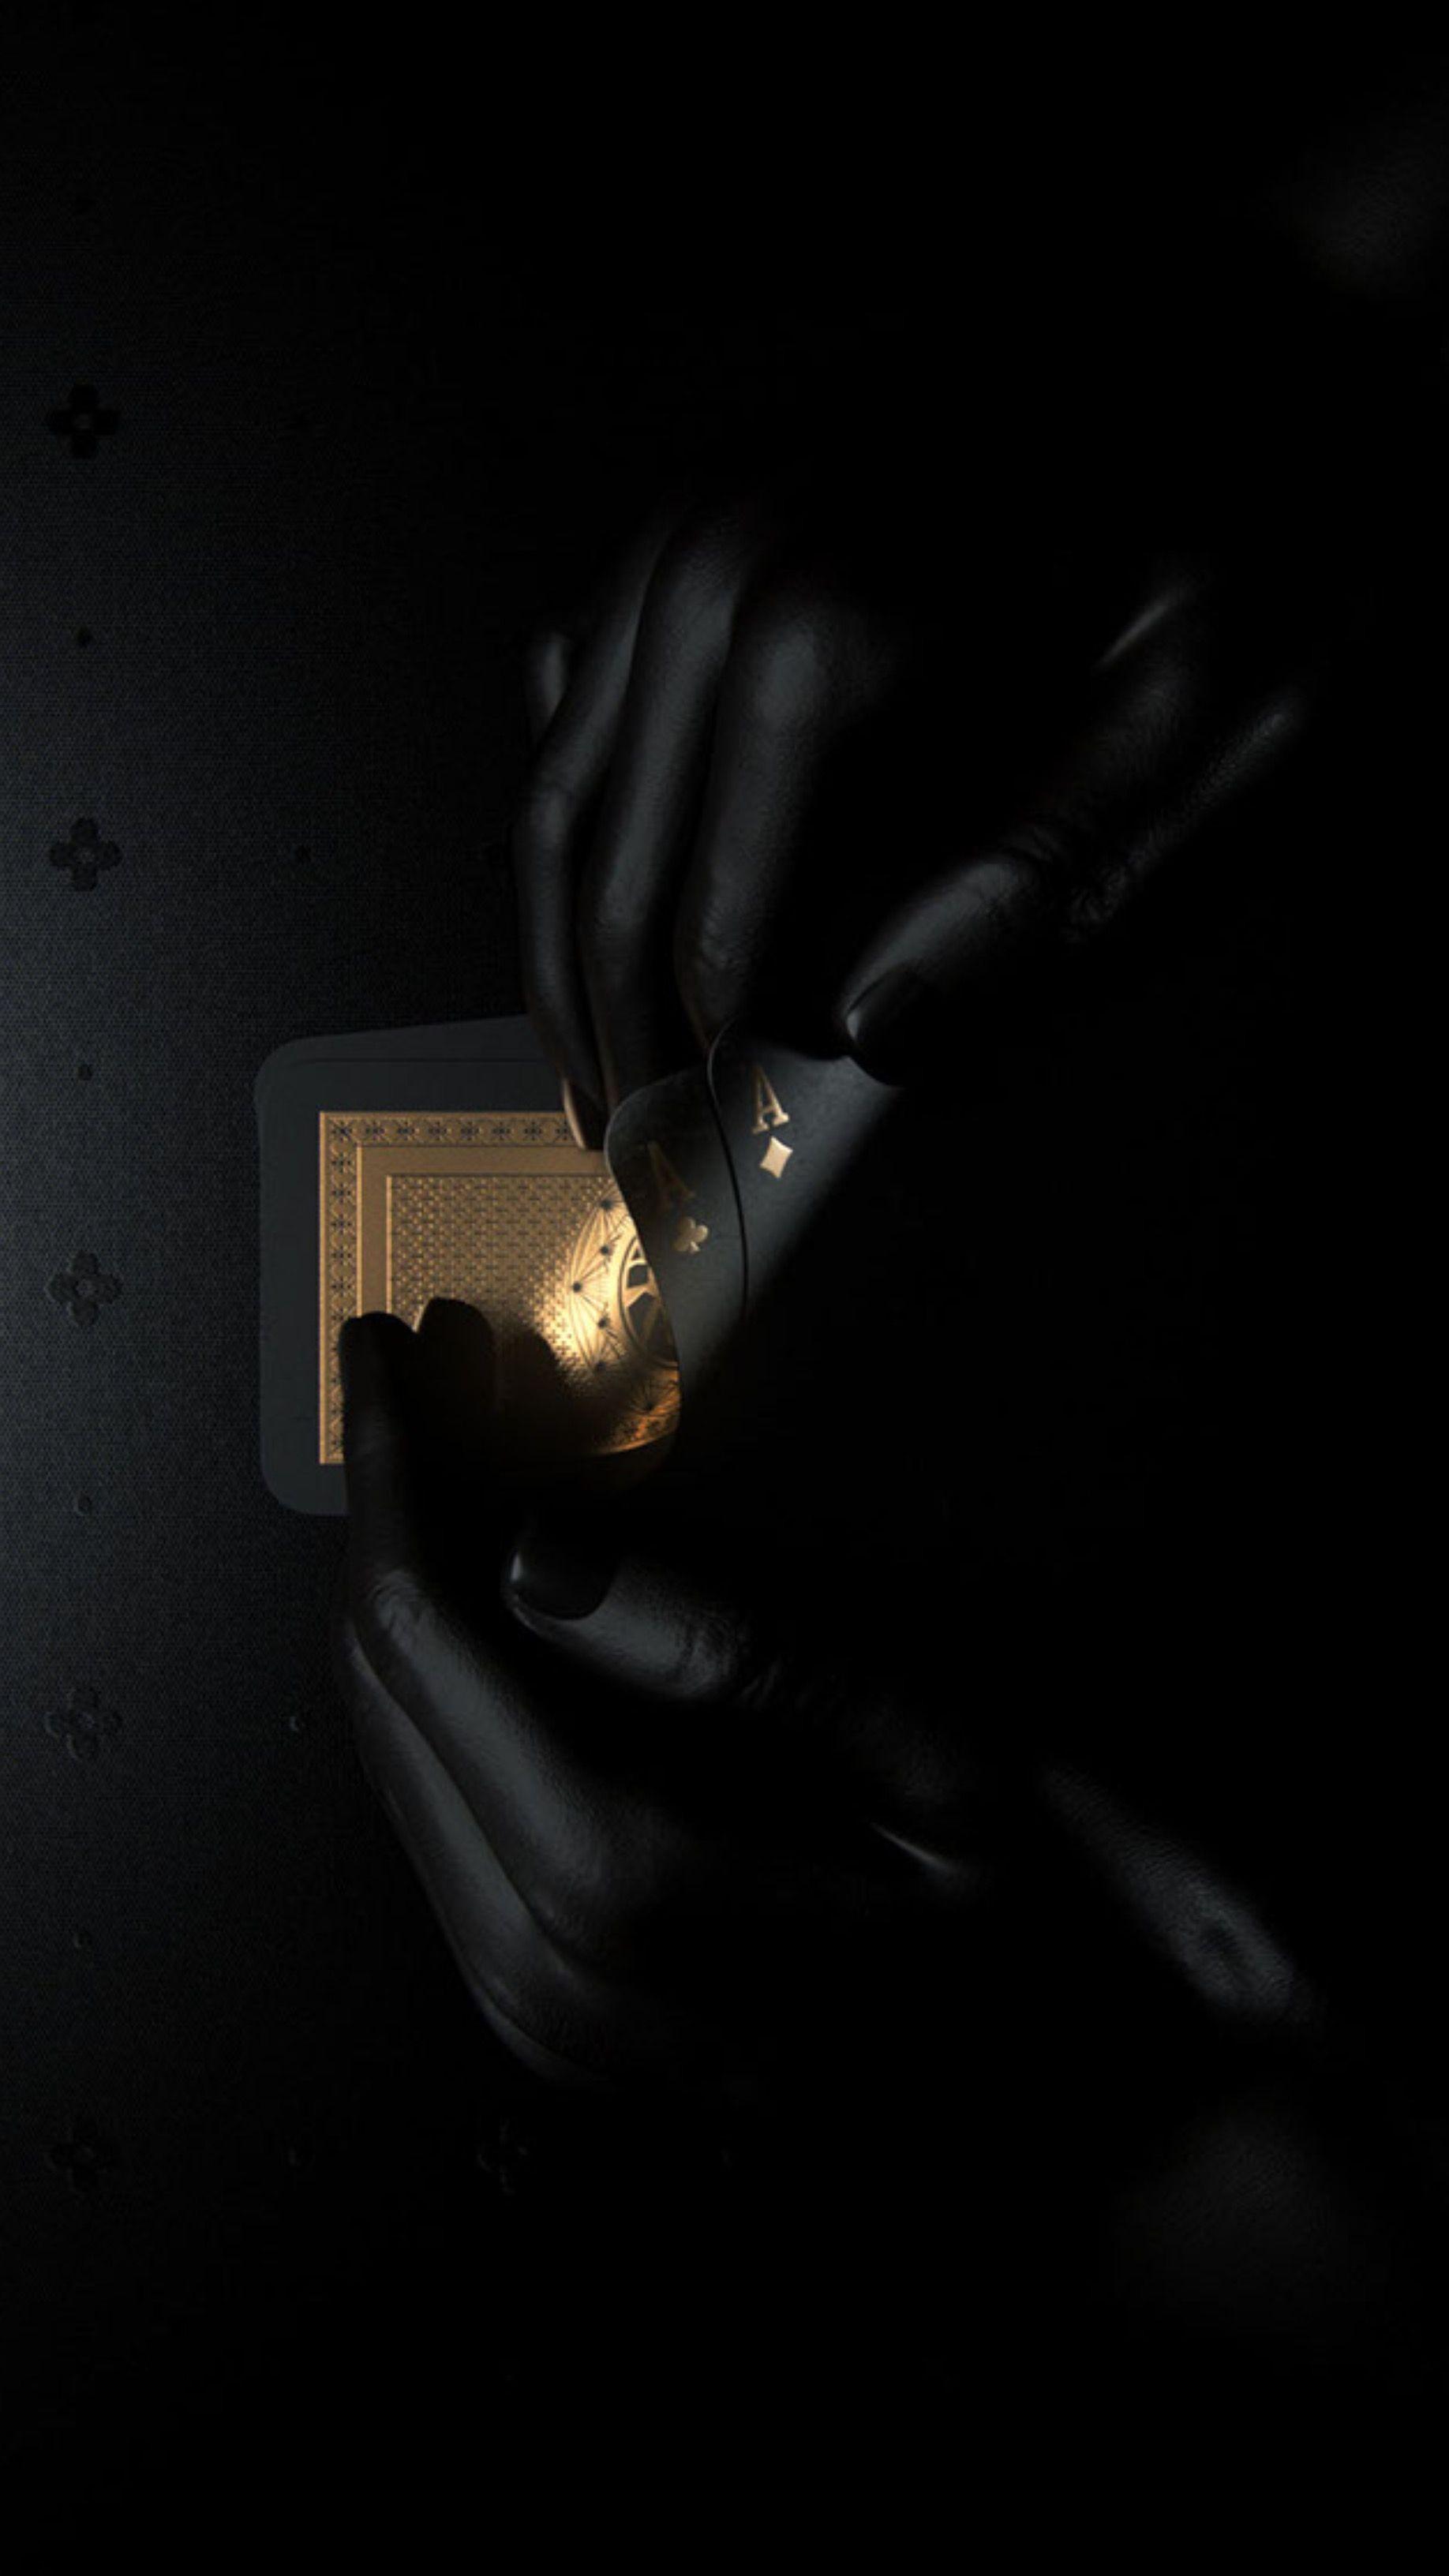 Black Phone Backgrounds Part 2 Black Phone Background Black And Gold Aesthetic Gold Aesthetic